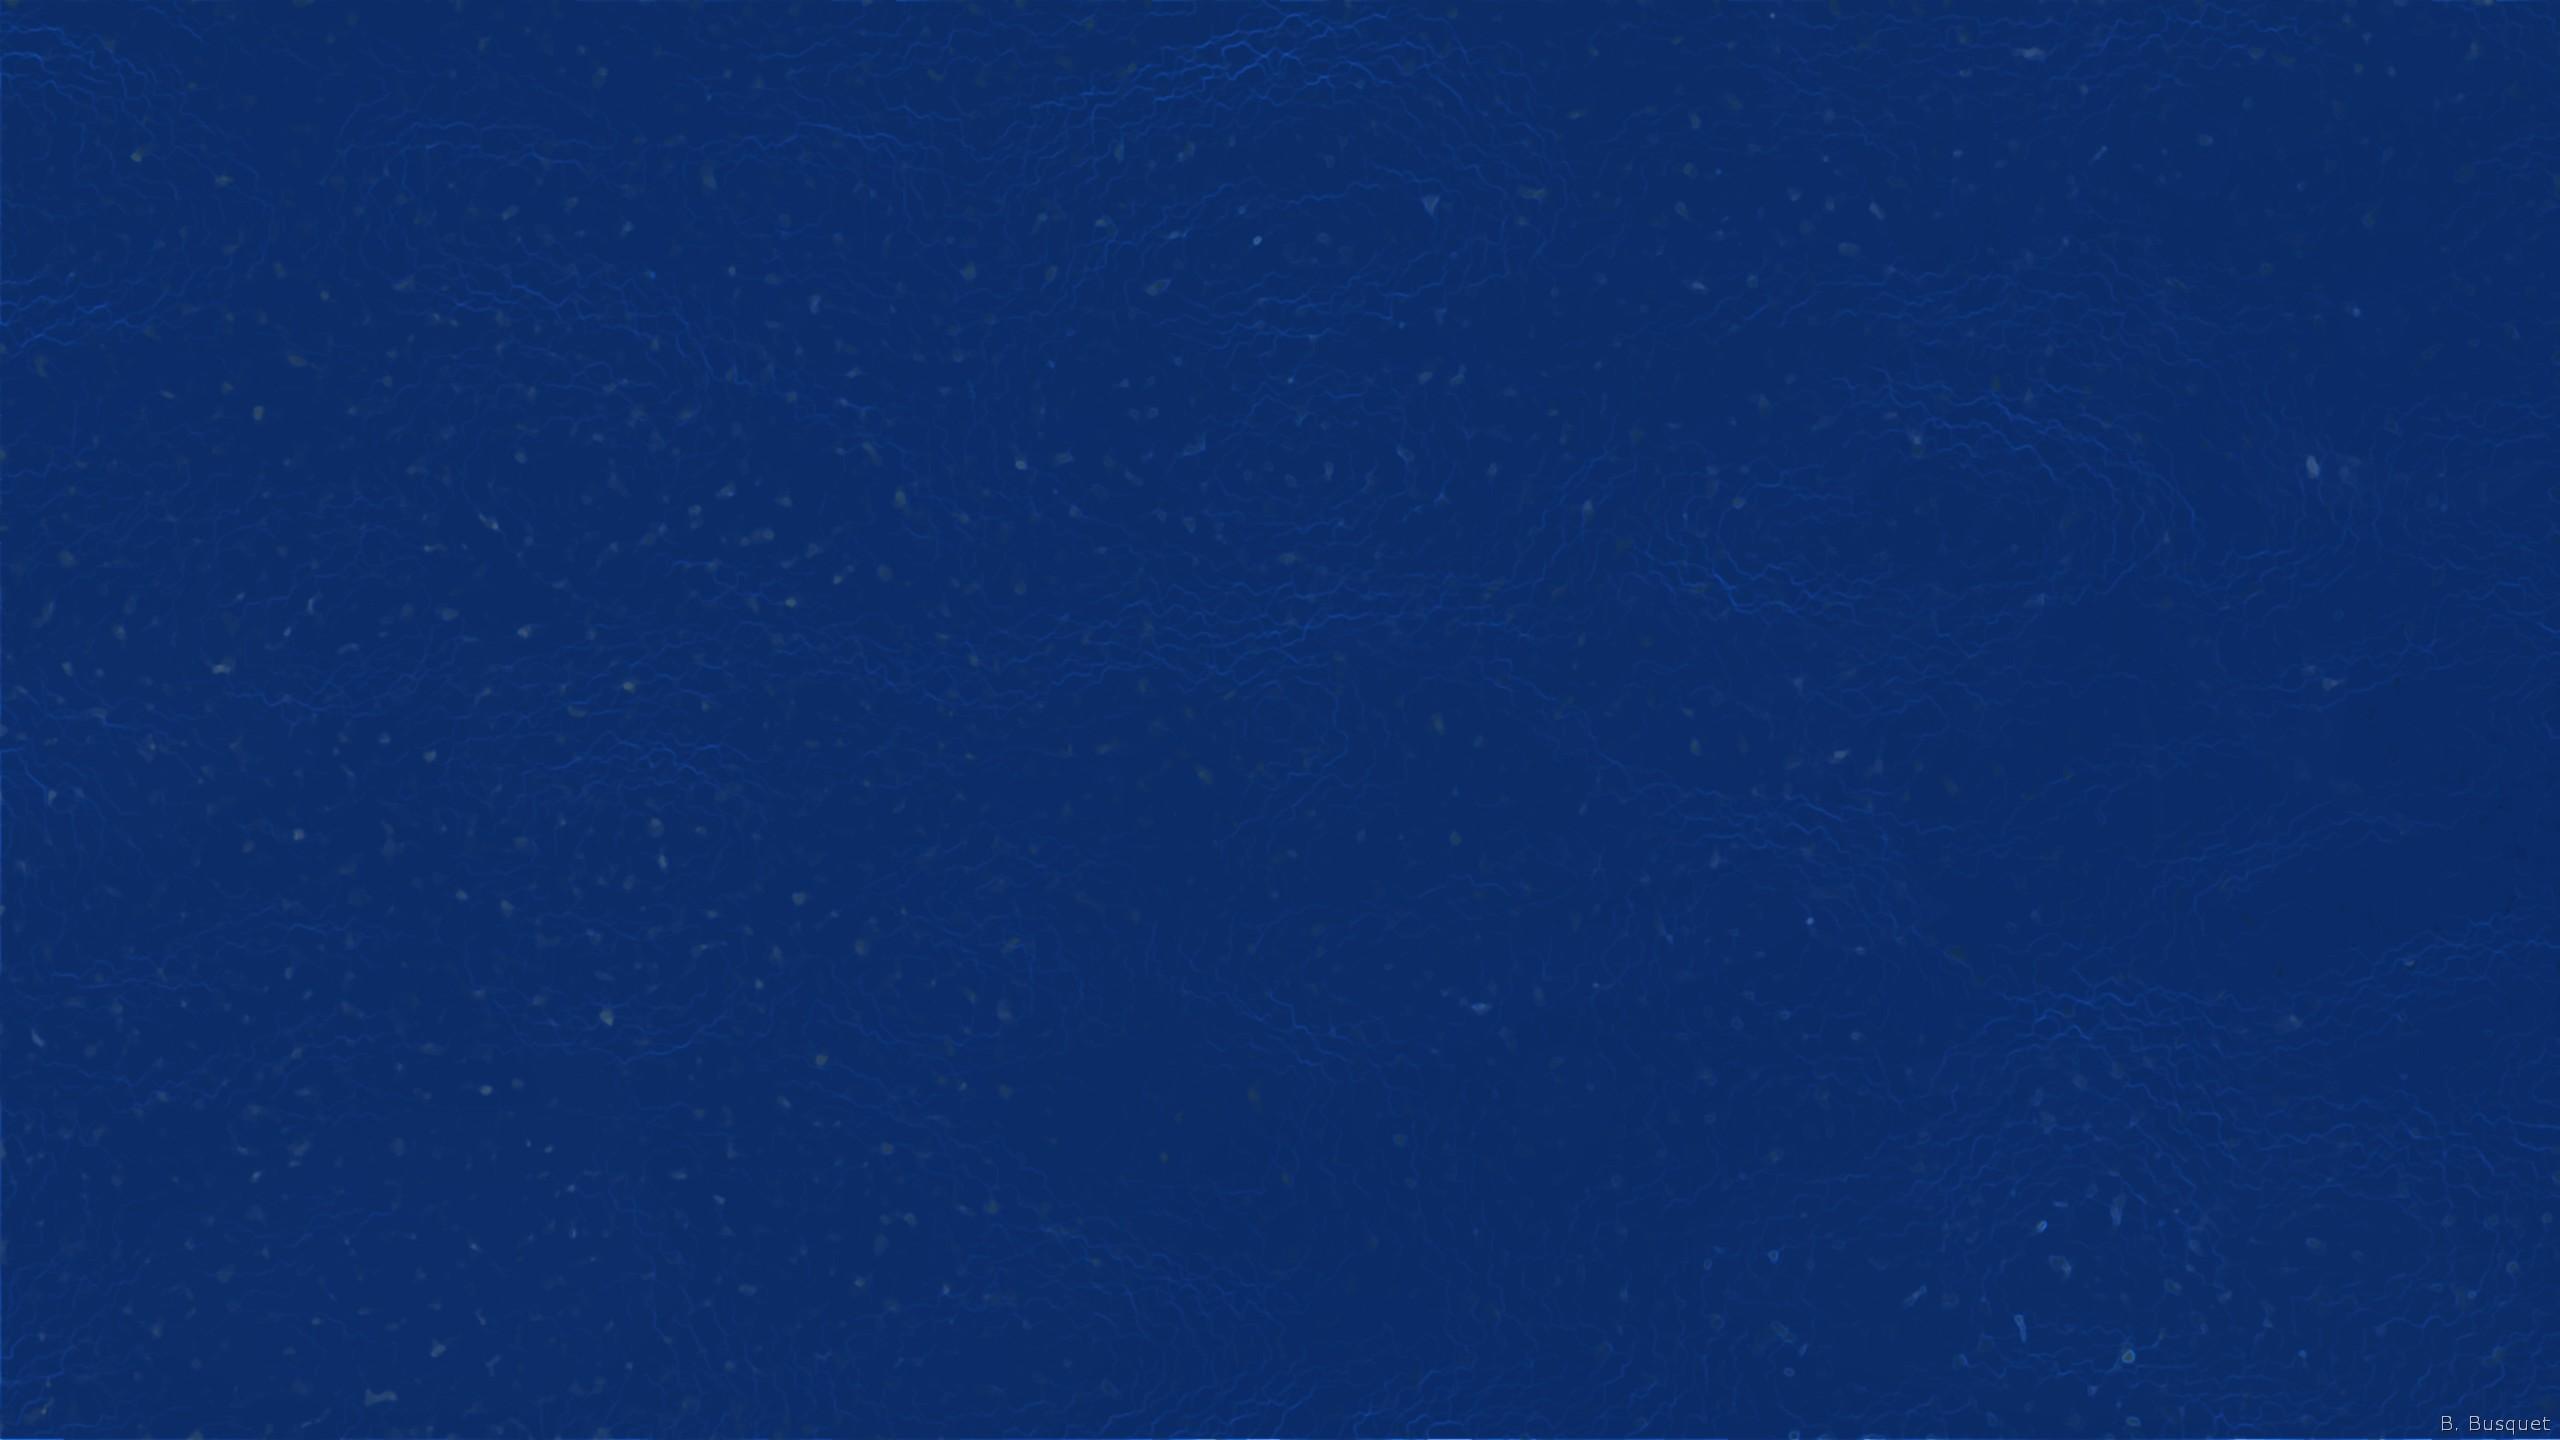 US Navy Backgrounds WallpaperPulse   Wallpapers 4k   Pinterest   Navy  wallpaper and Wallpaper